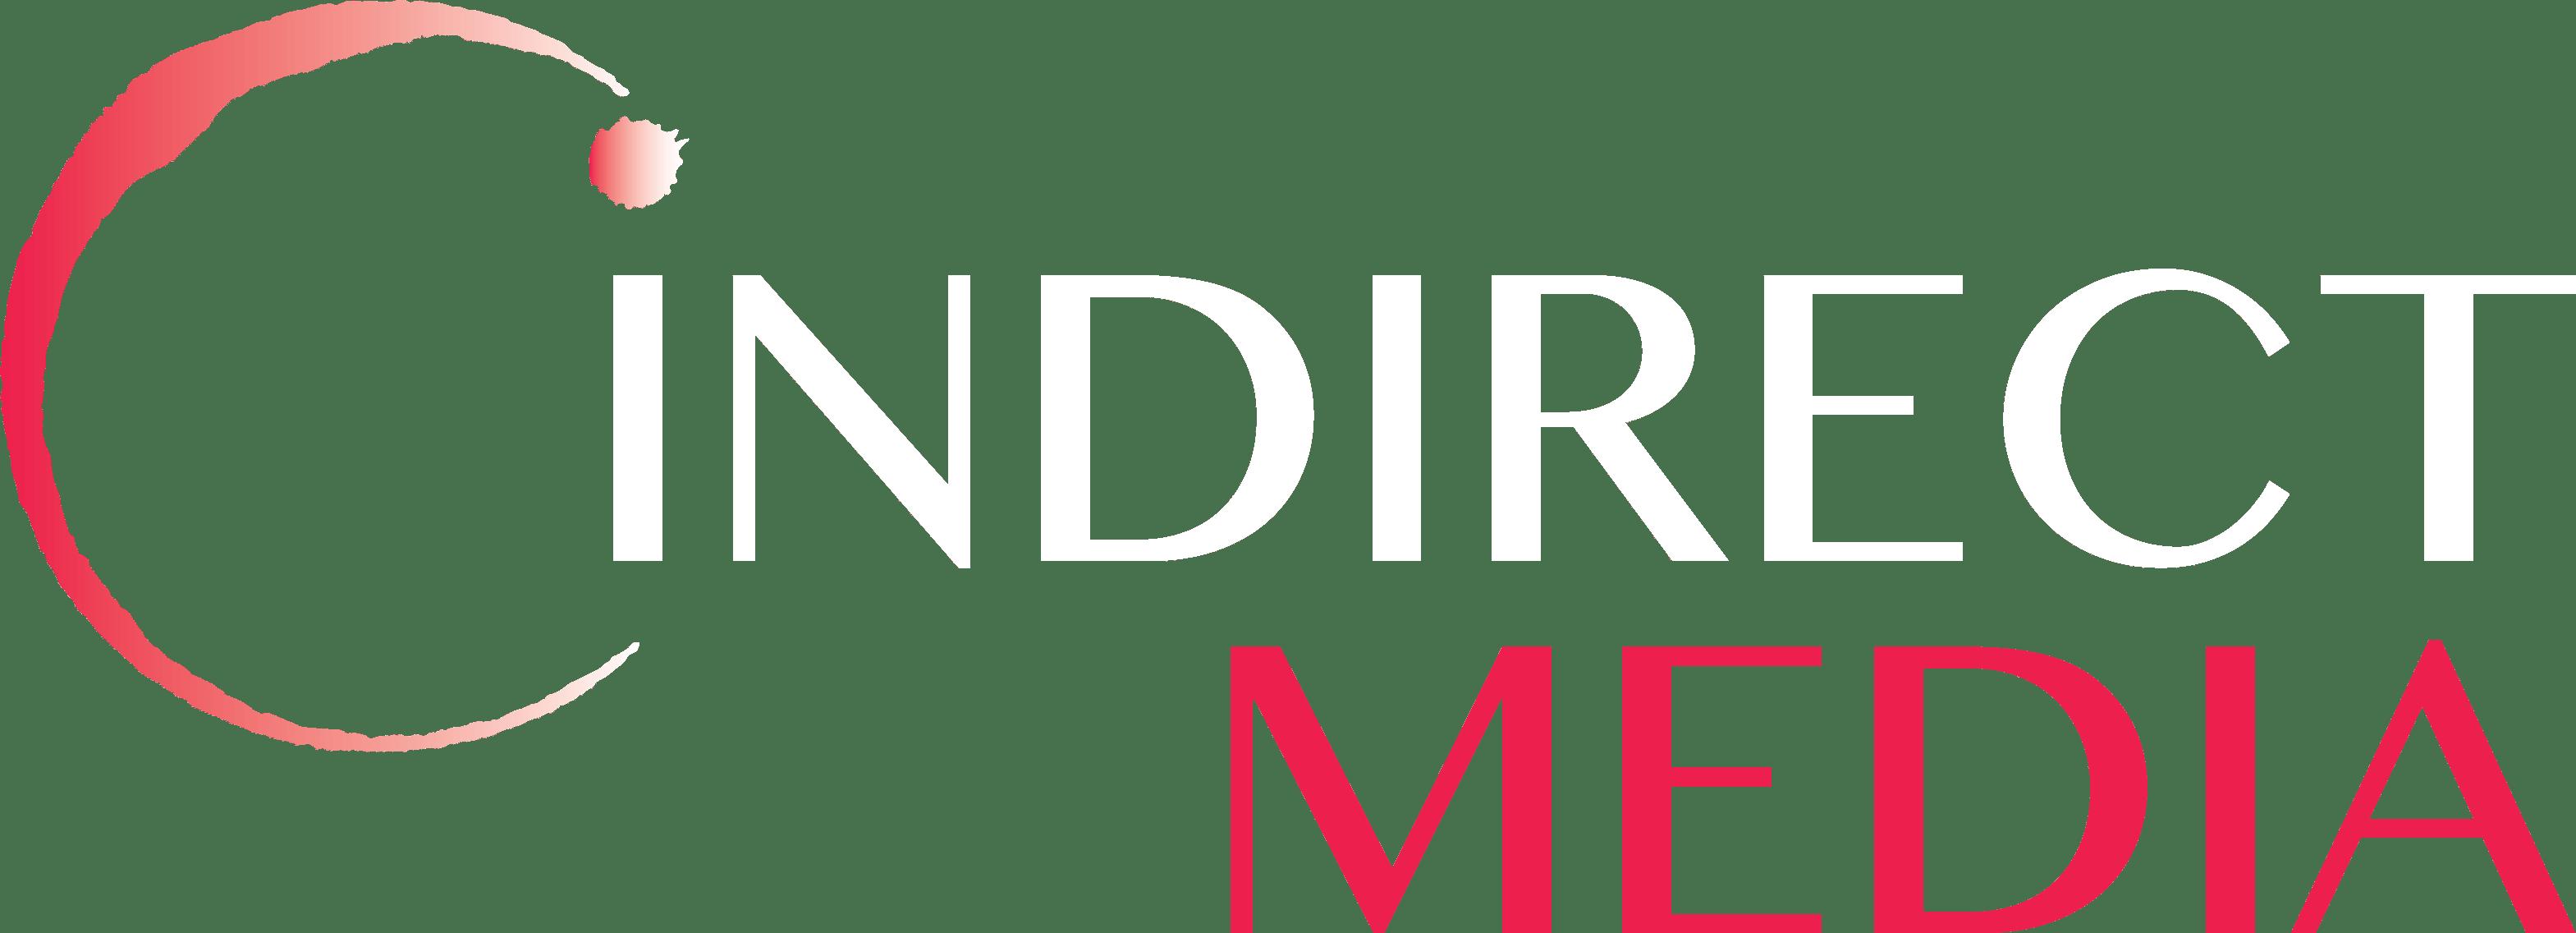 Indirect Media